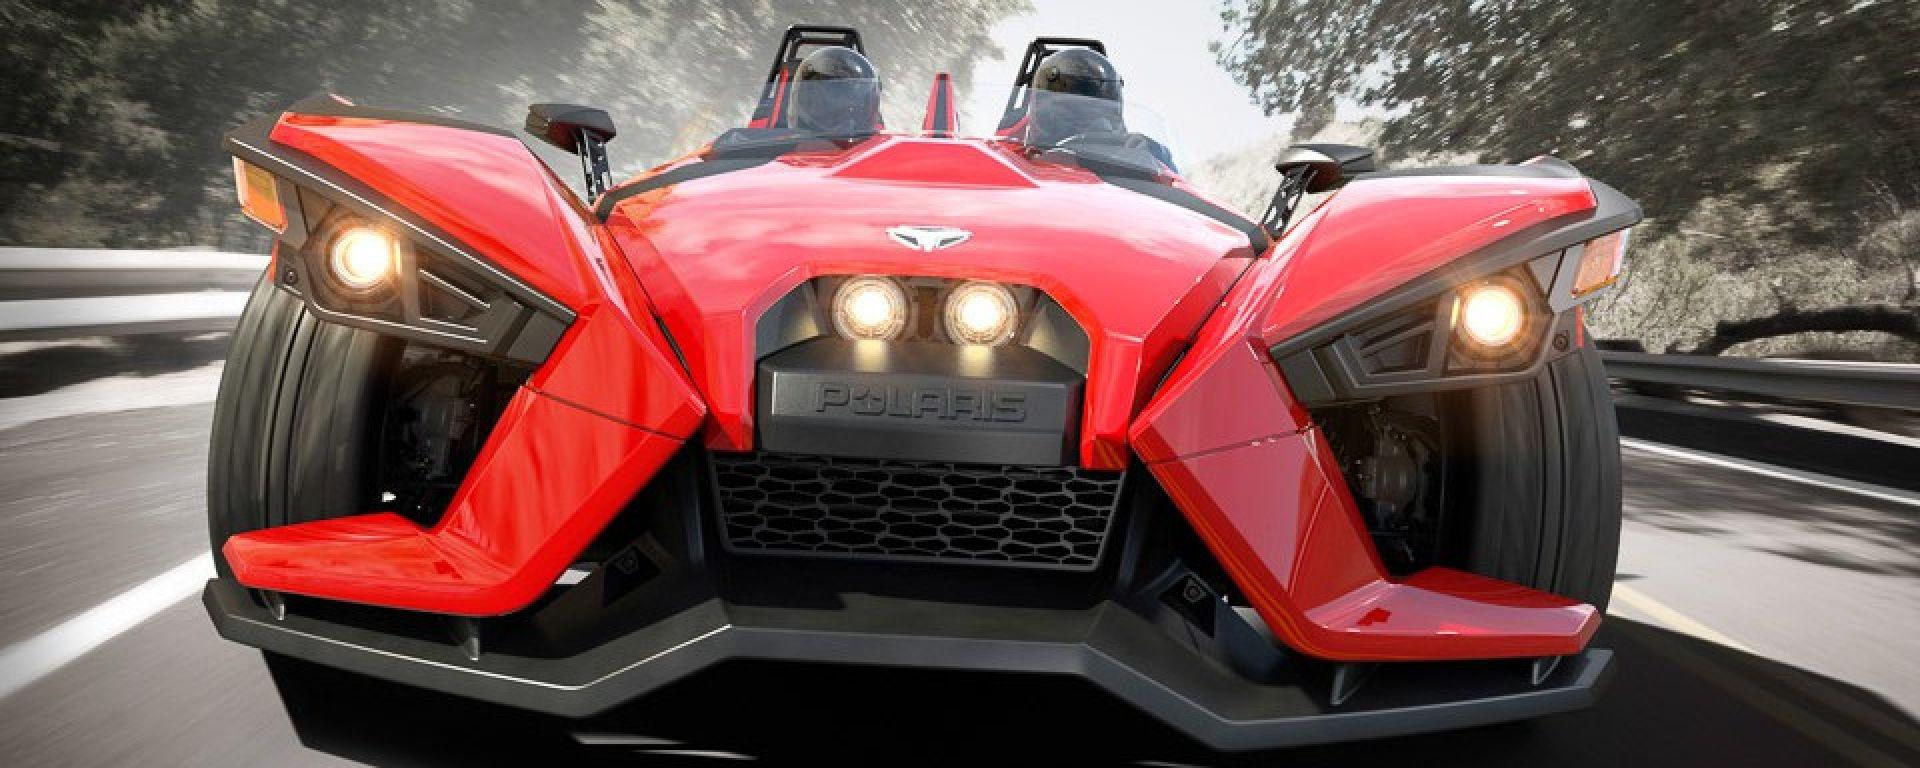 Tre ruote: Polaris Slingshot - MotorBox